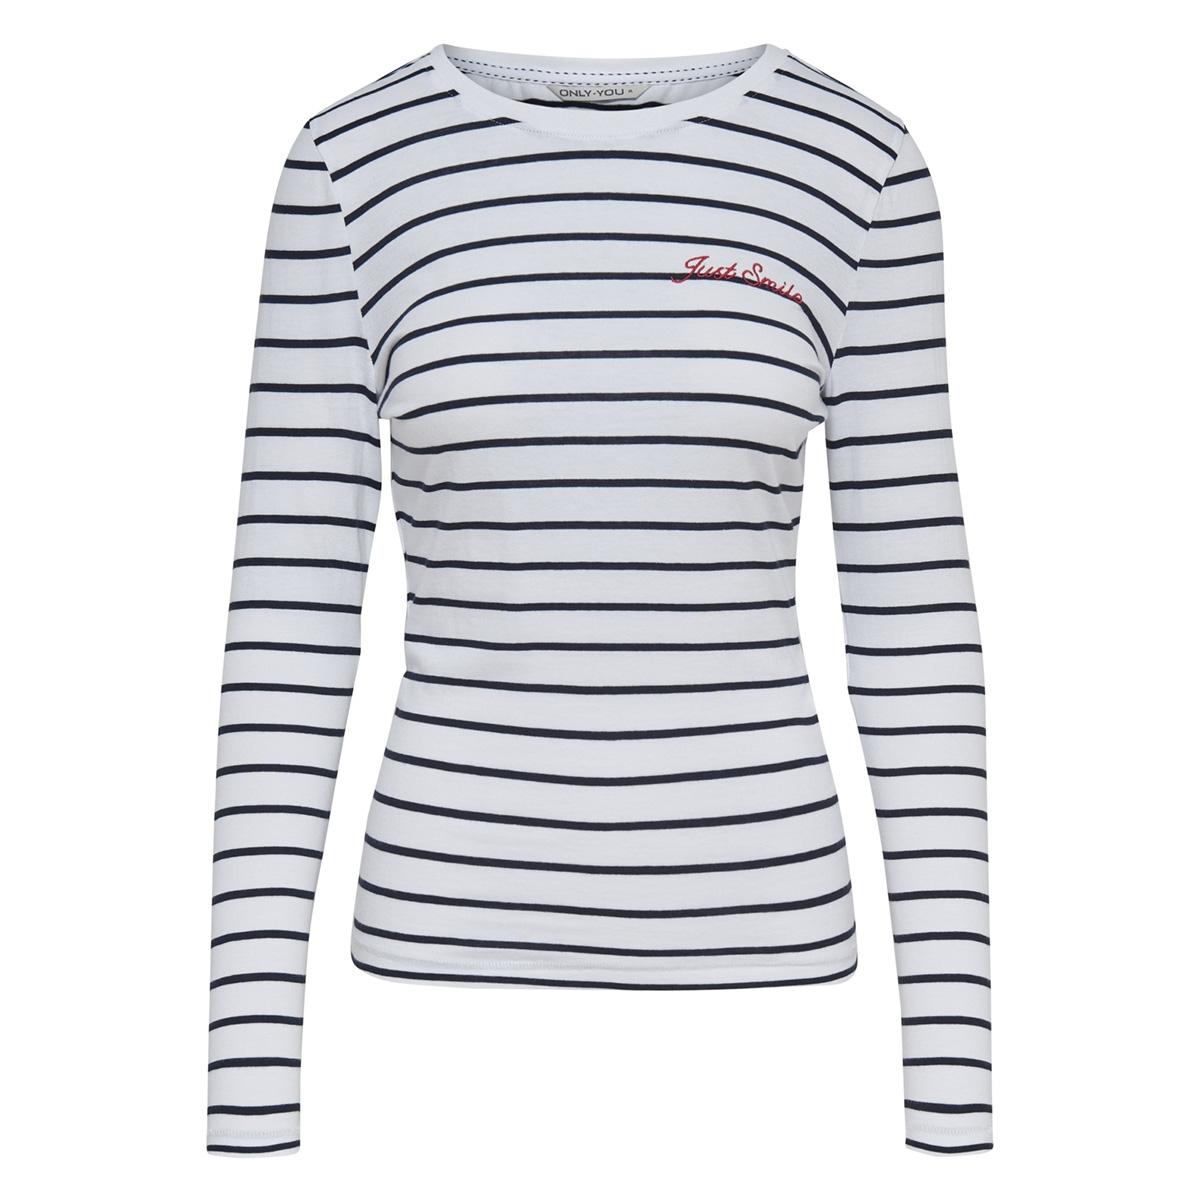 onykira l/s top box jrs 15178084 only t-shirt bright white/night sky